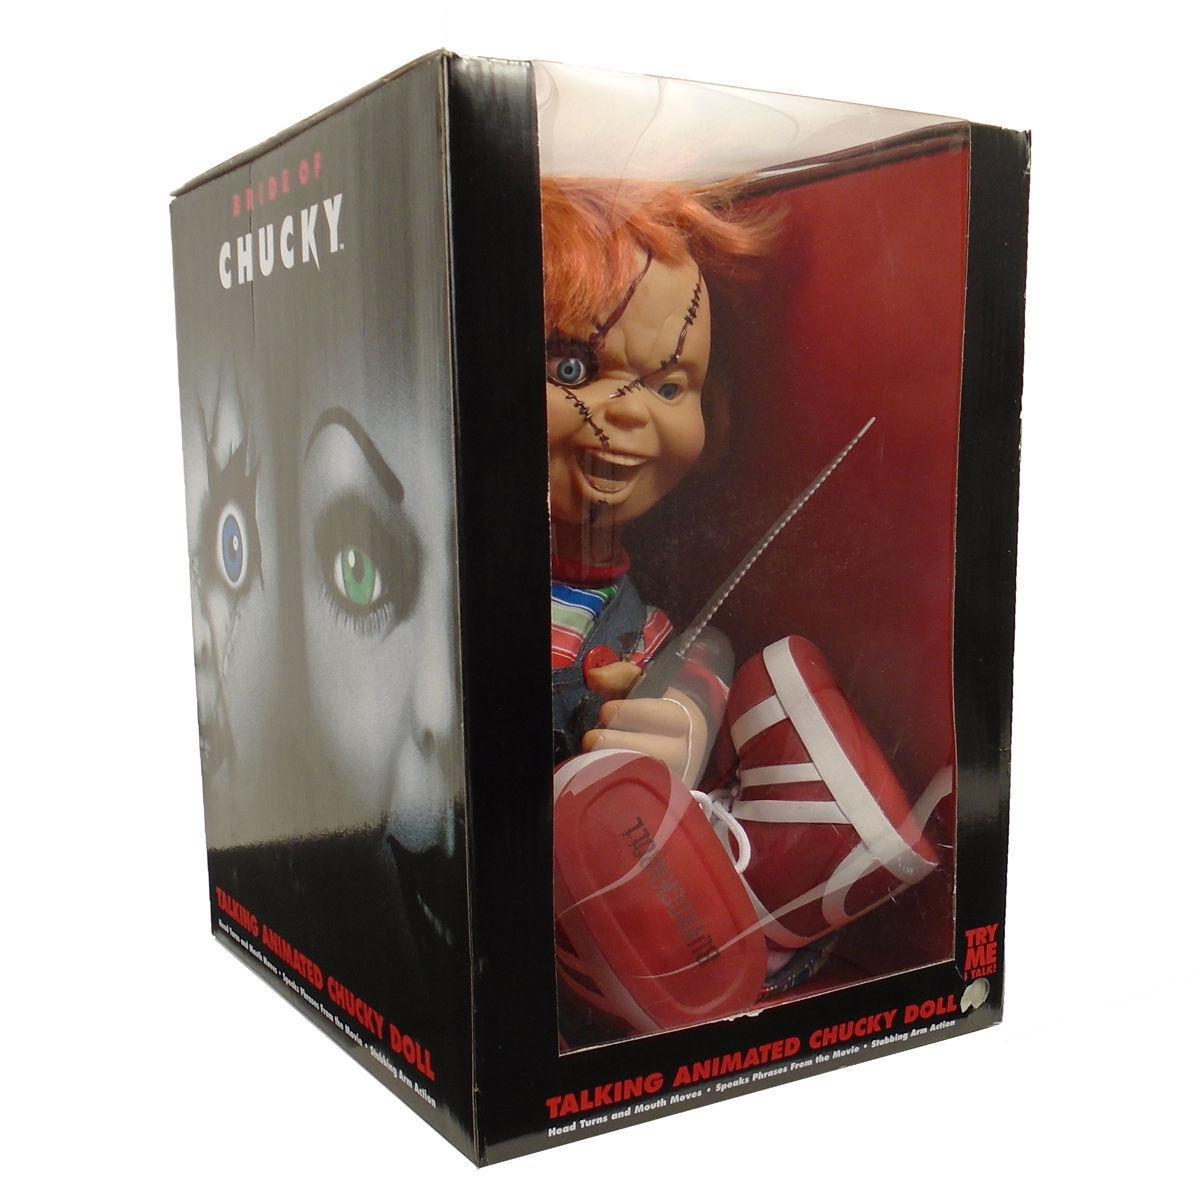 Bride of Chucky Movie: 2015 Animated Talking Chucky Life Size 24